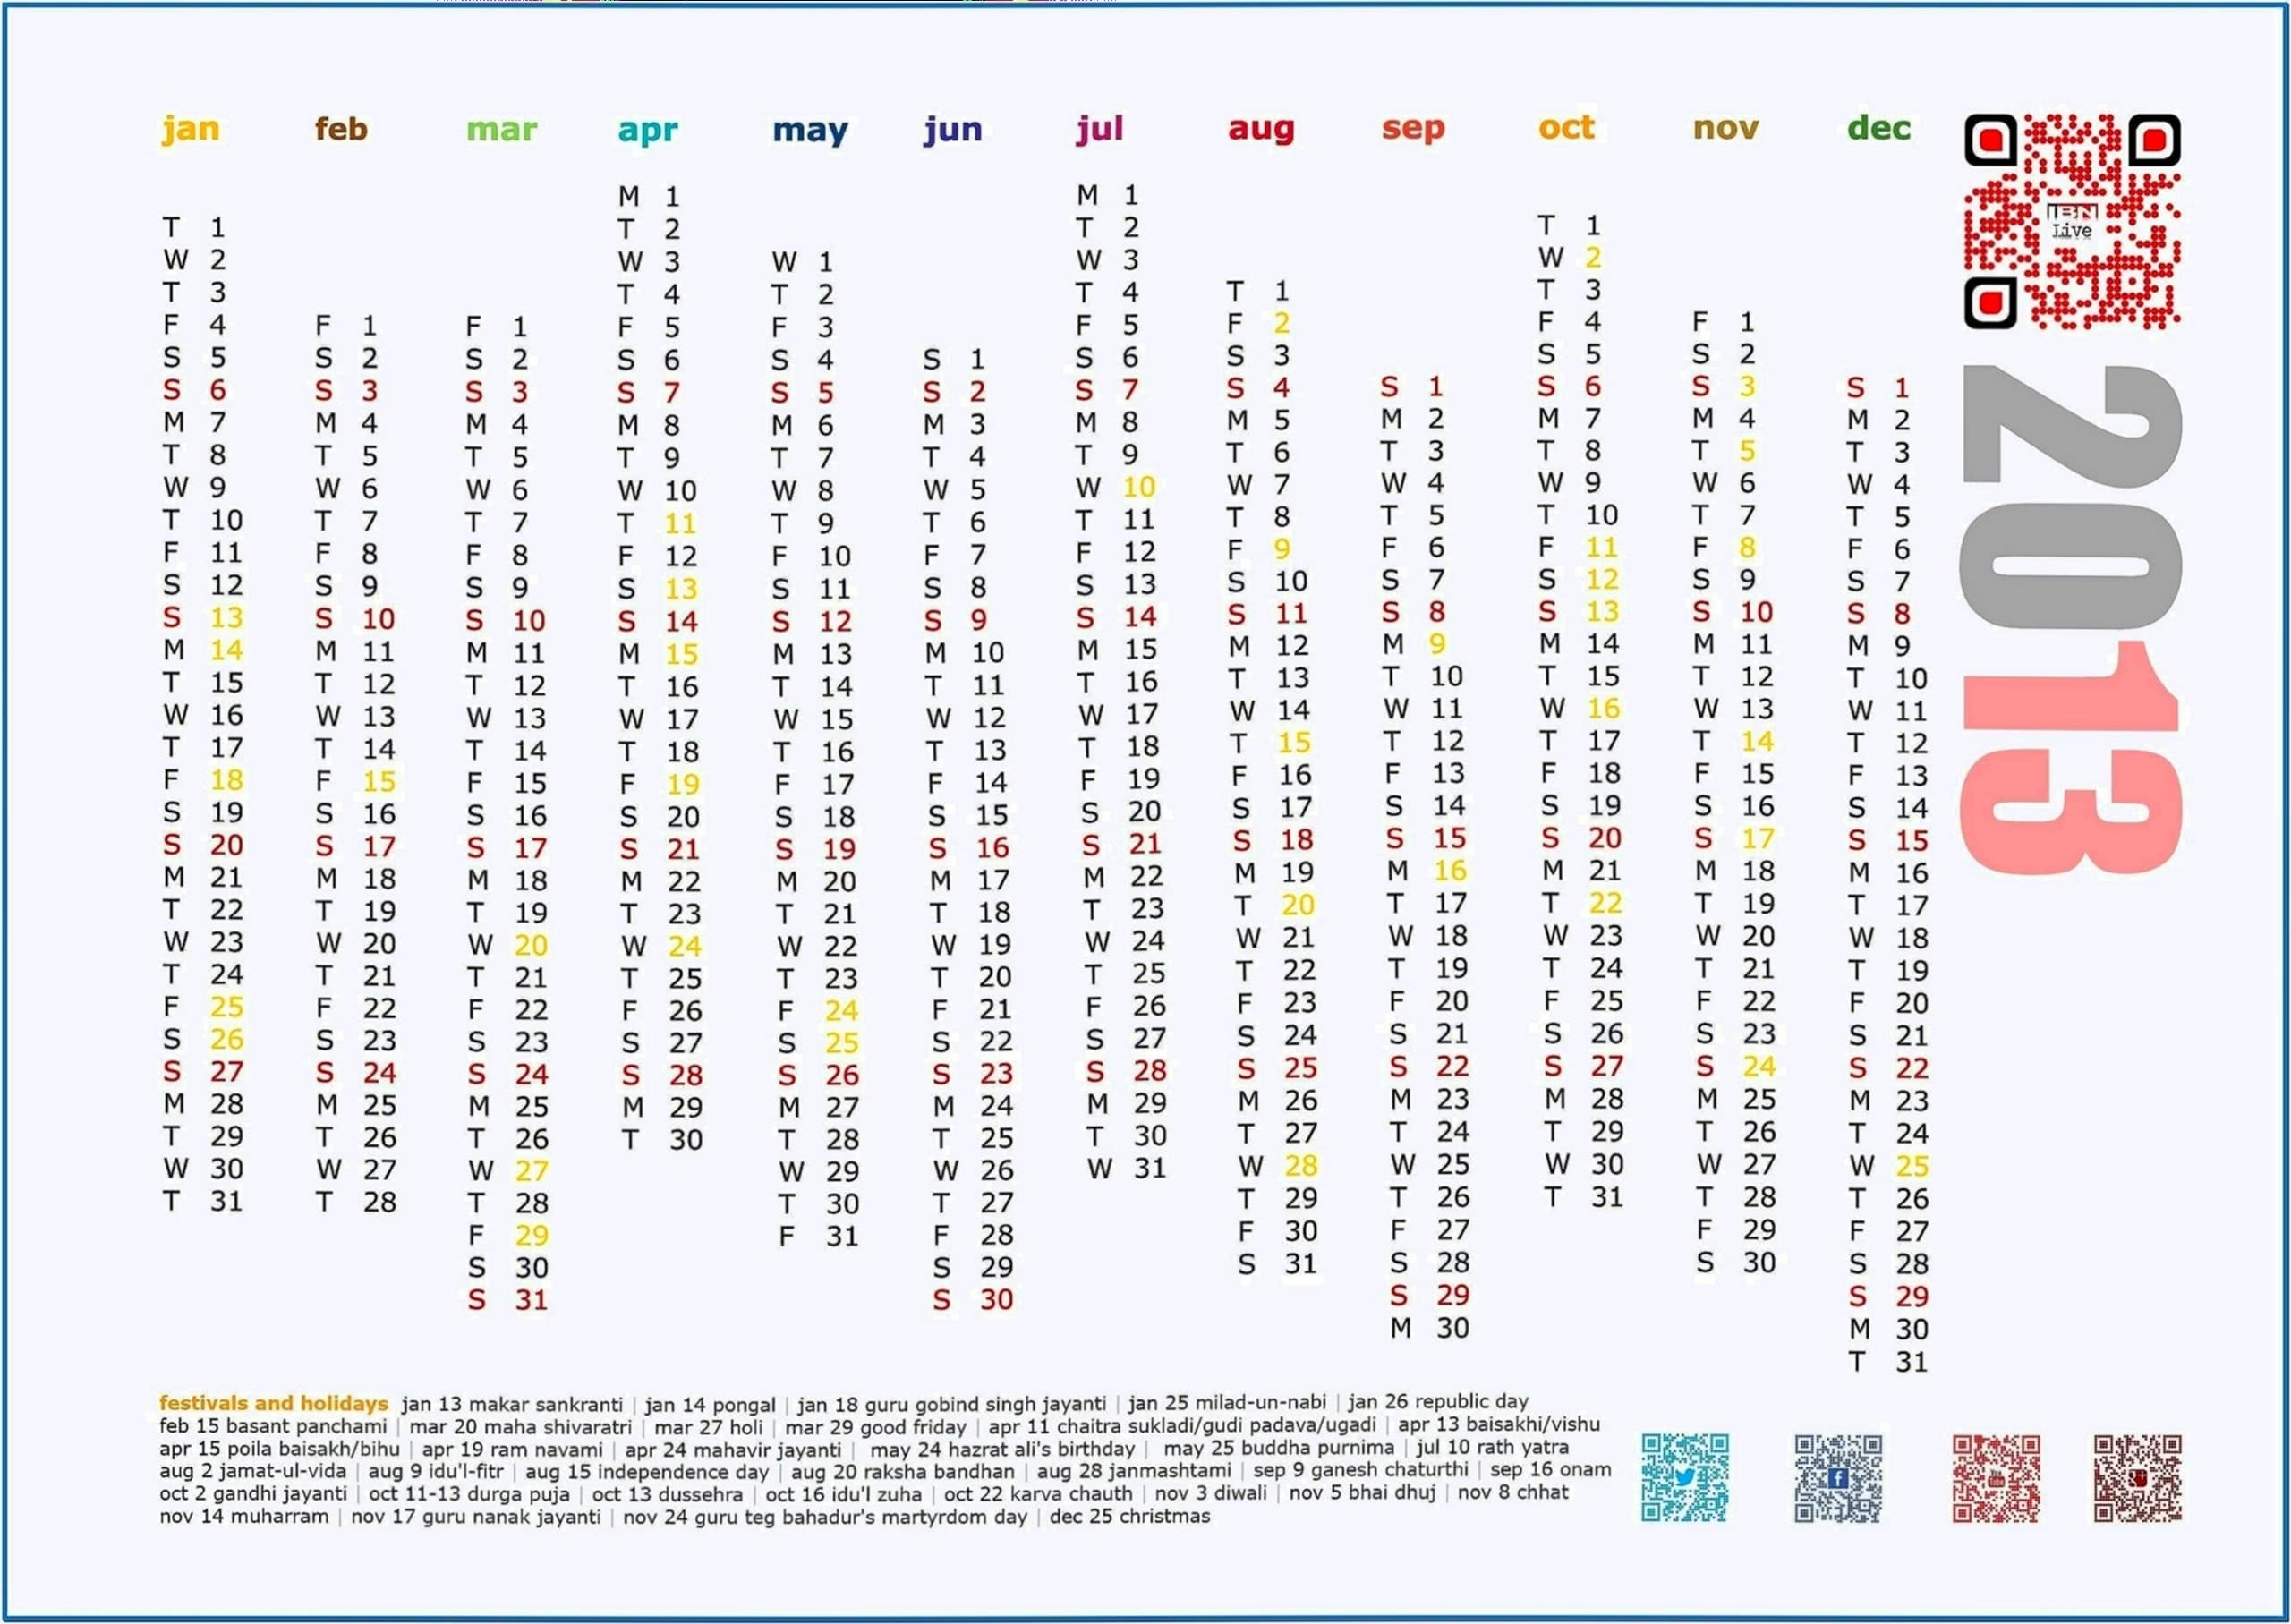 Kingfisher Calendar 2020 Screensaver